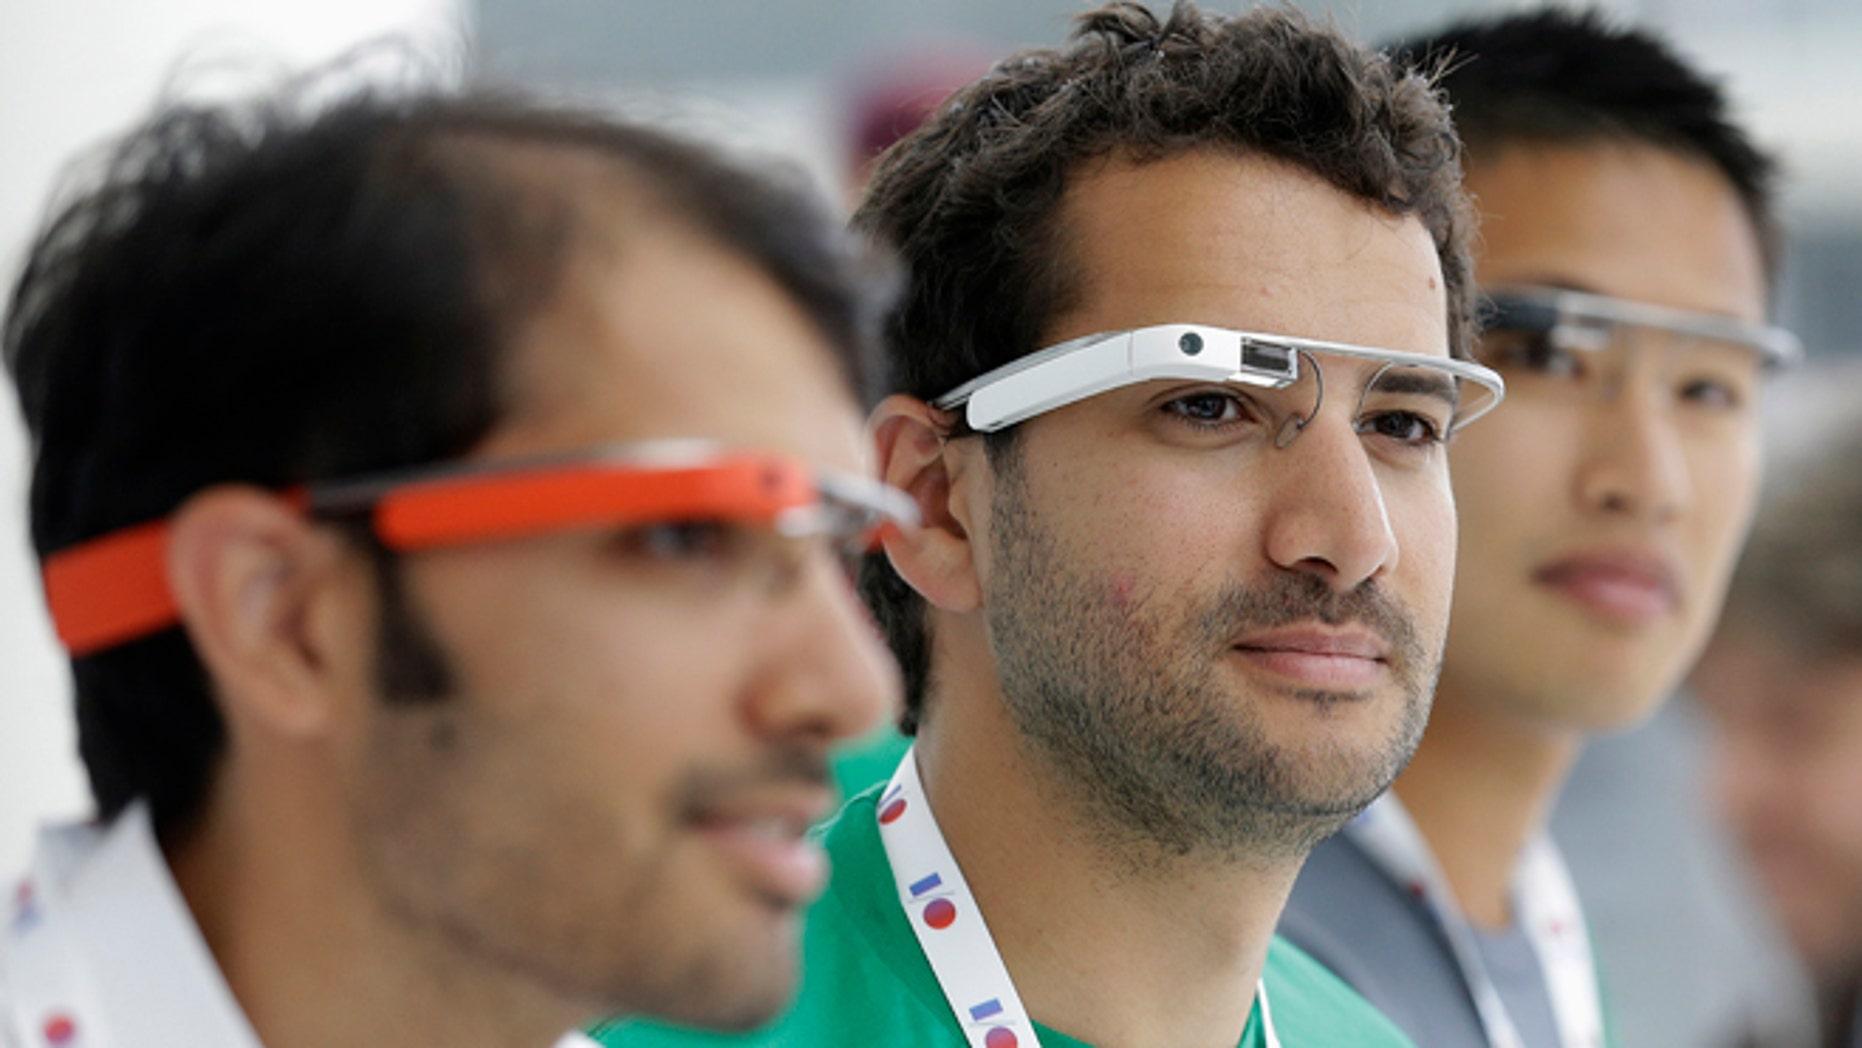 May 15, 2013: Google Glass team members wear Google Glasses at a booth at Google I/O 2013 in San Francisco.